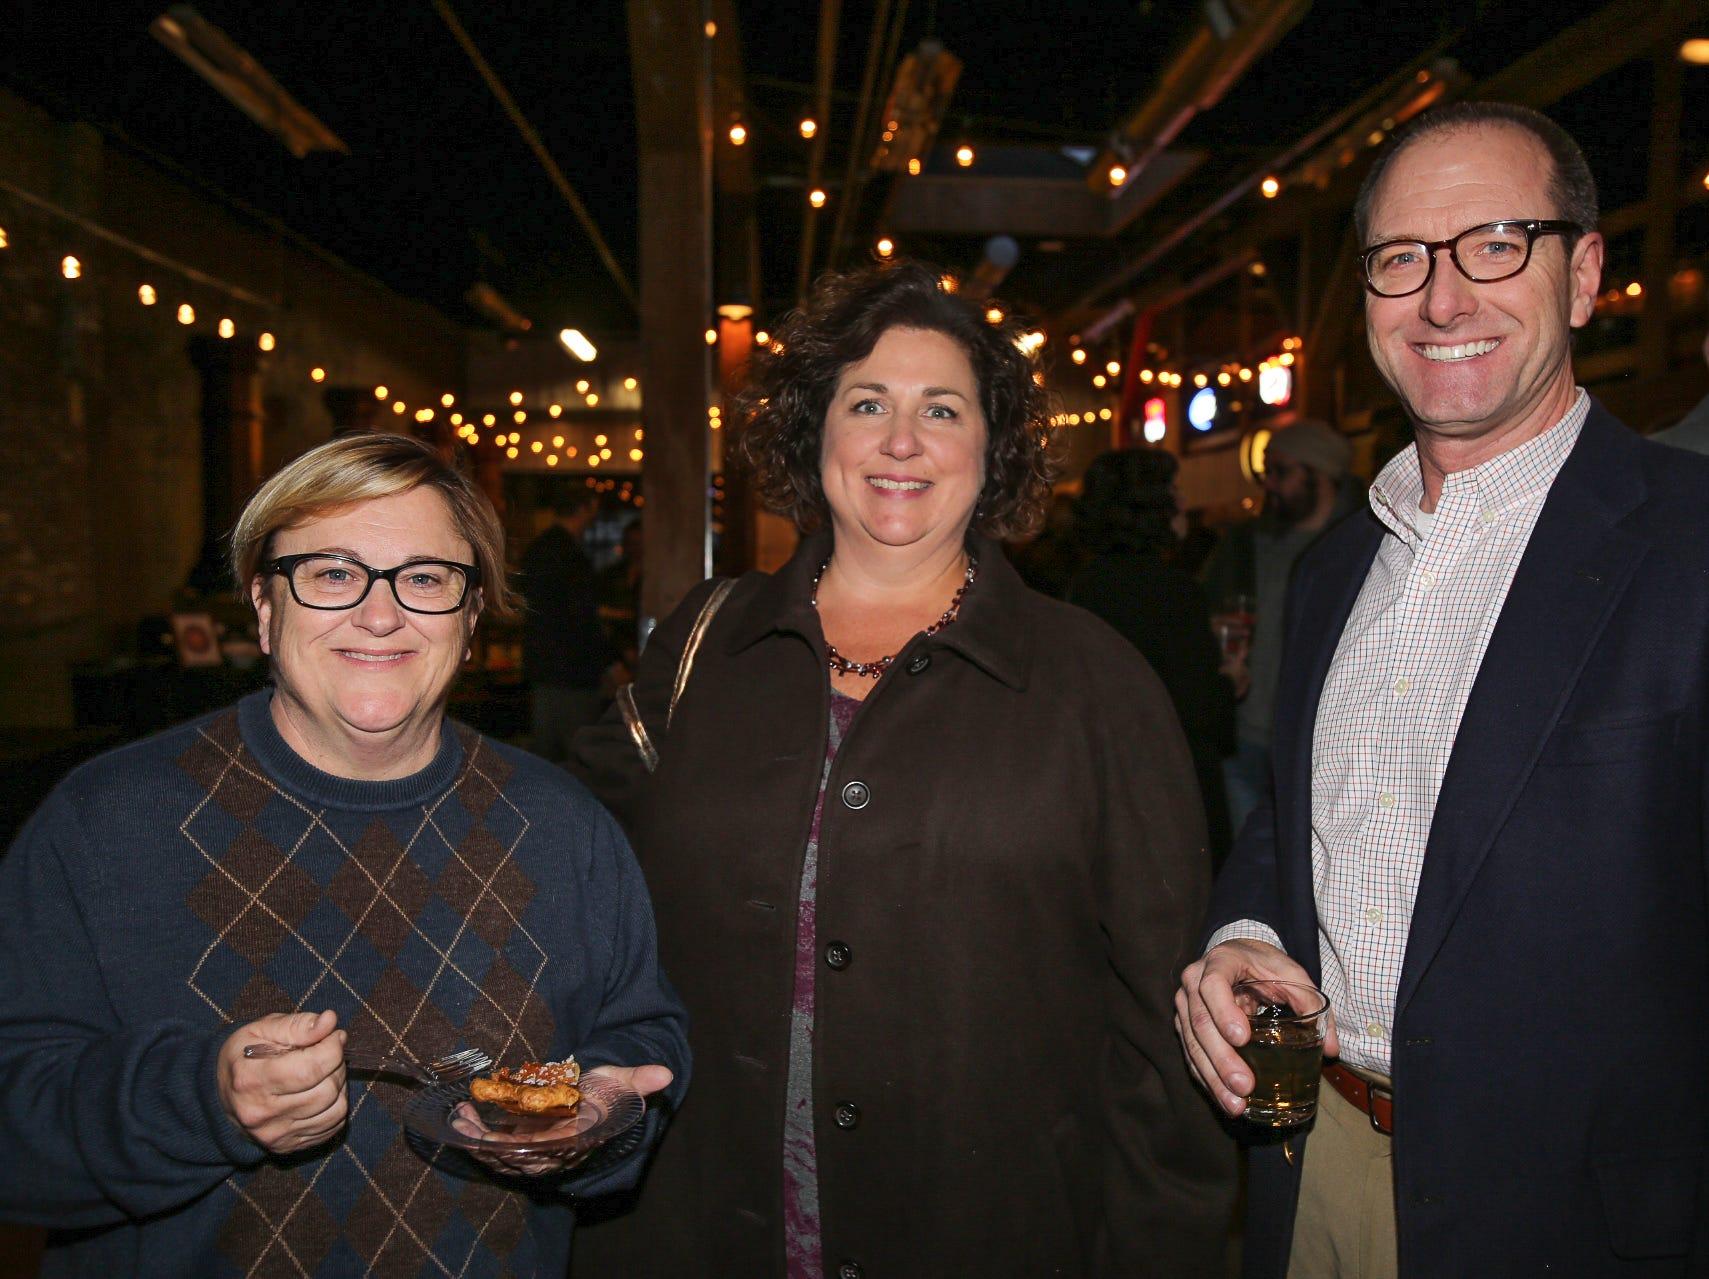 Beth Domann, Jennifer Jackson, and Todd Brierly